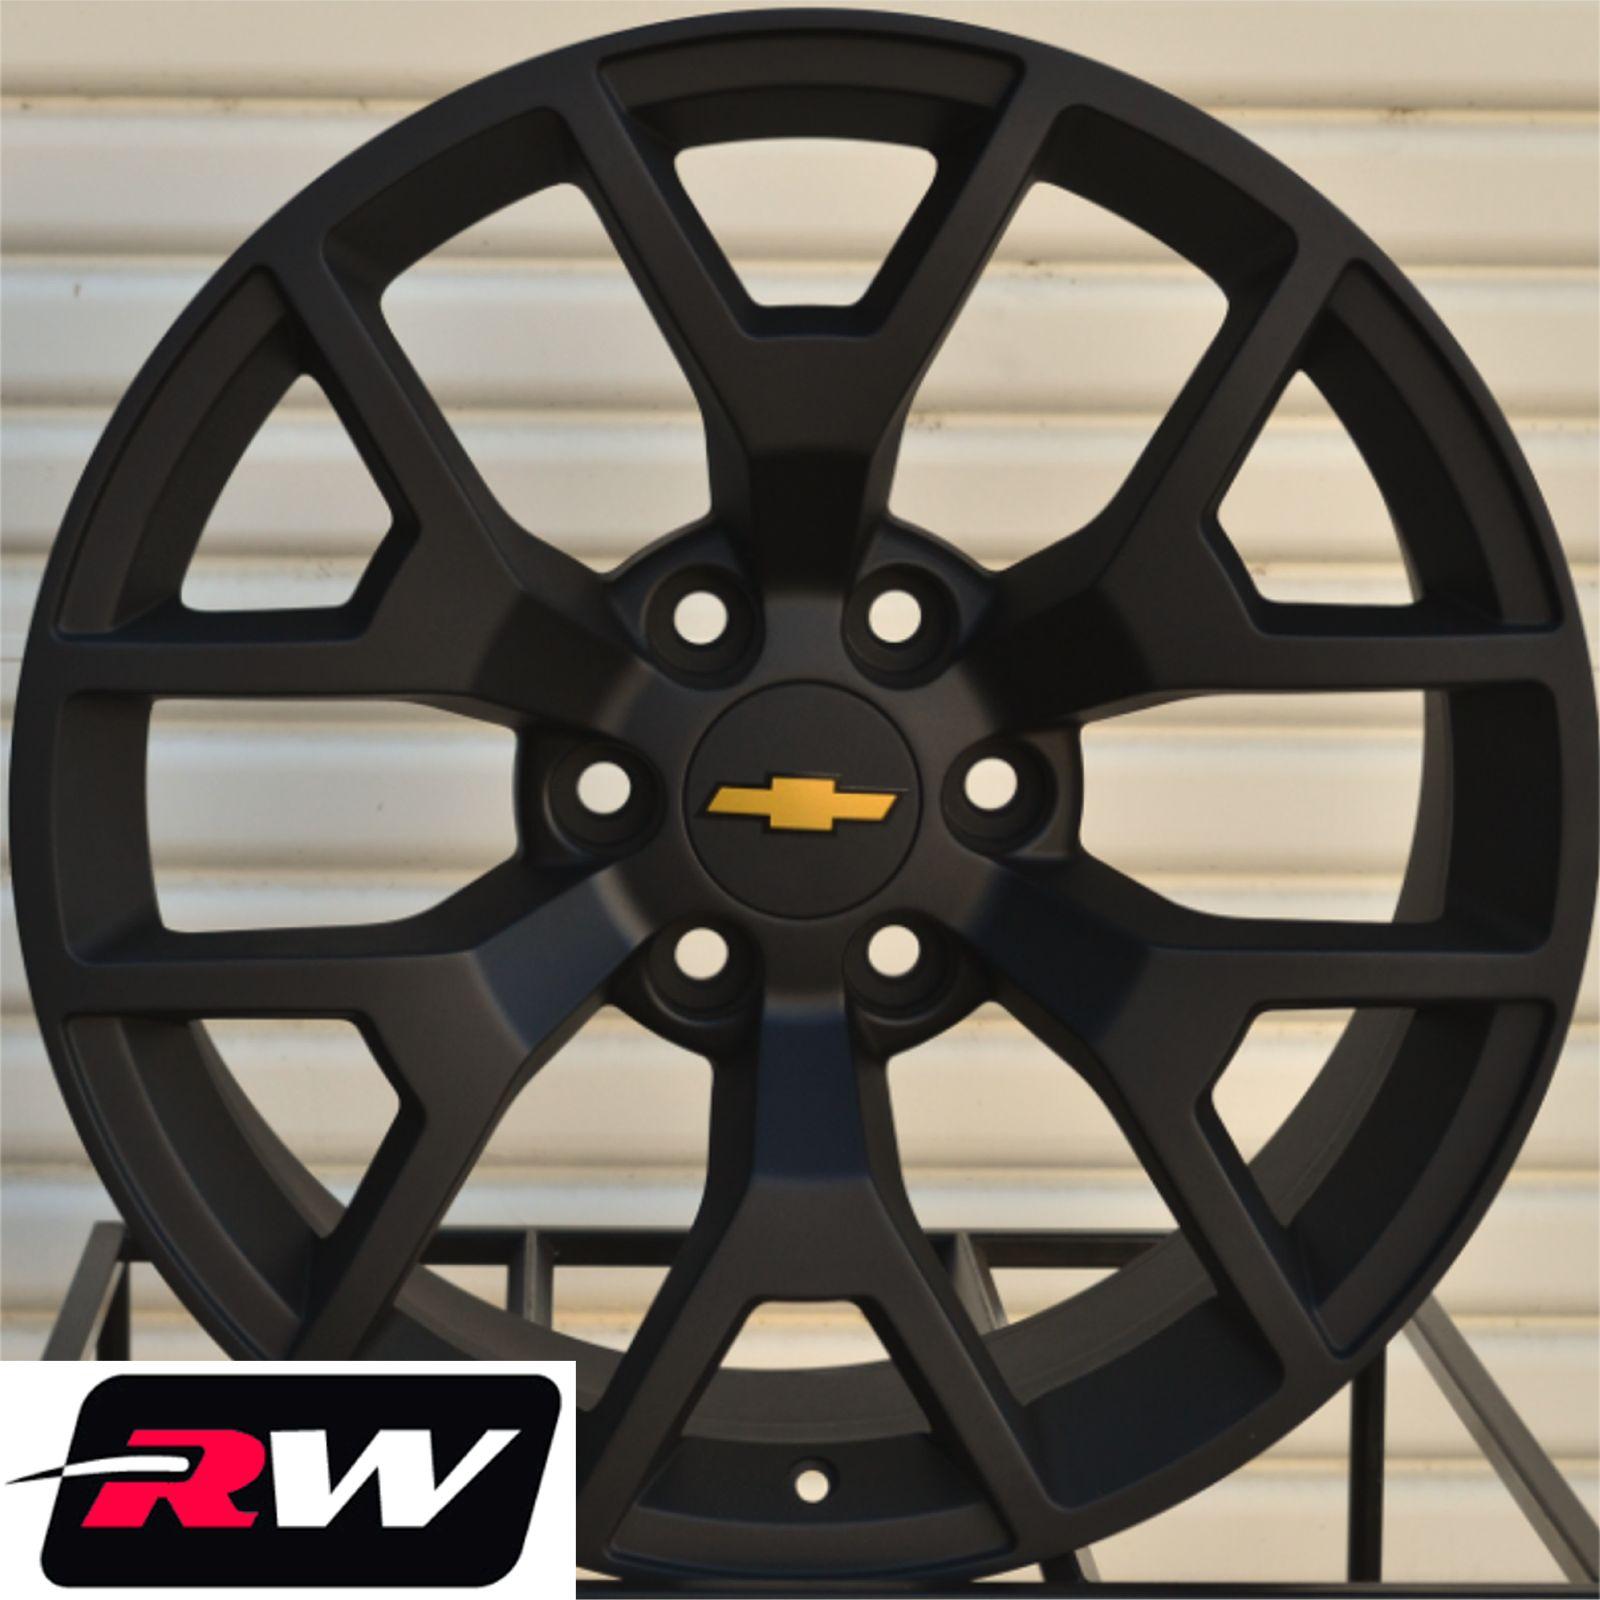 Buy GMC Sierra Wheels Tires 22 inch Matte Black Rims Chevy Silverado